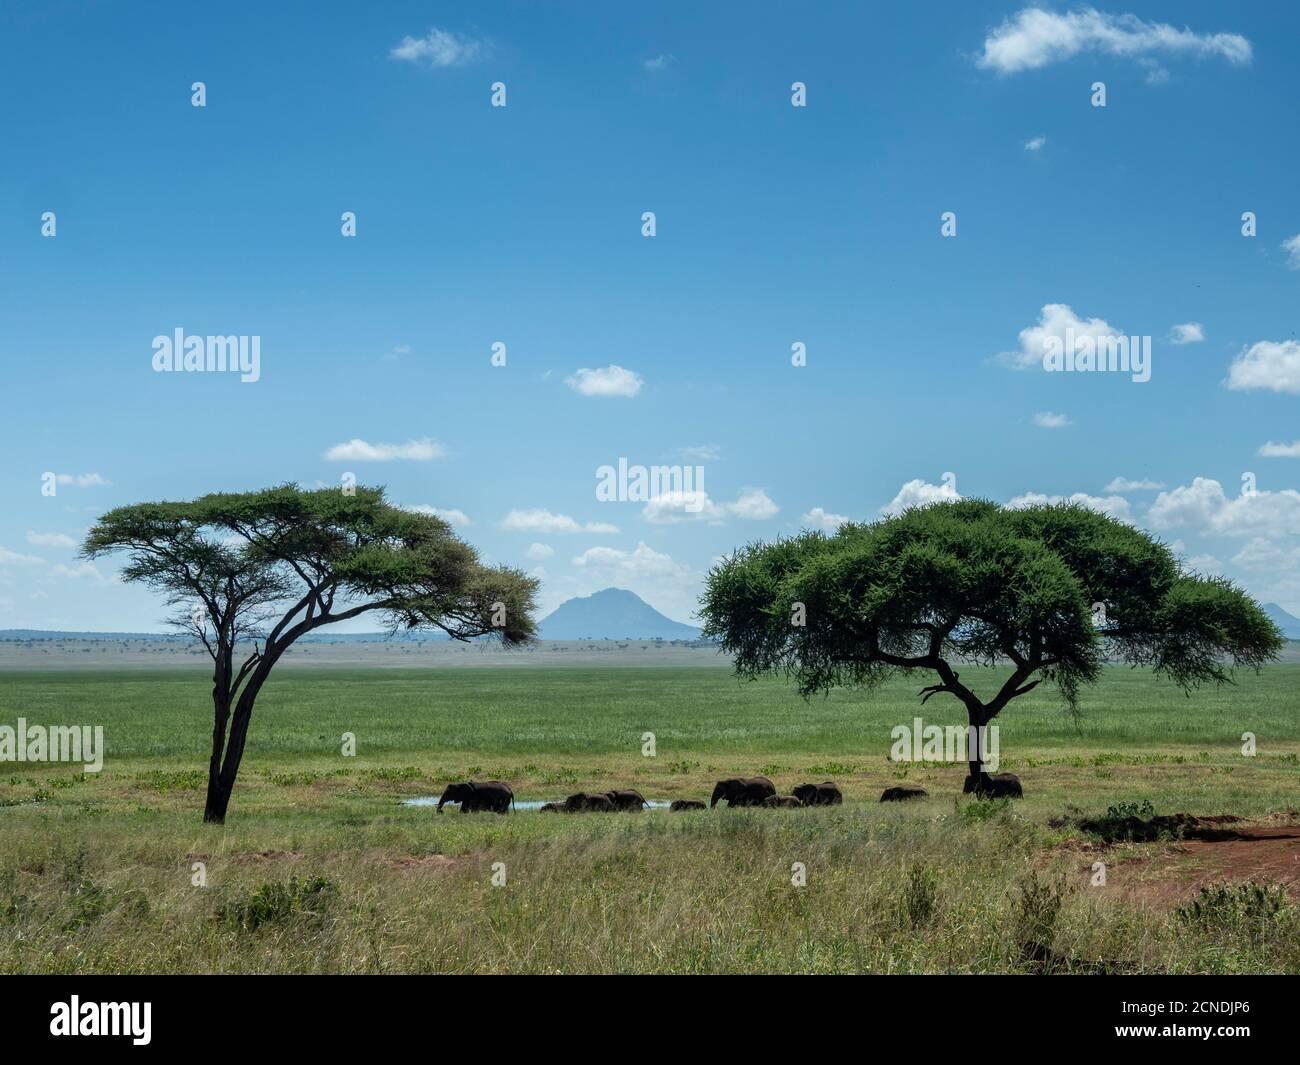 A herd of African bush elephants (Loxodonta africana), Tarangire National Park, Tanzania, East Africa, Africa Stock Photo